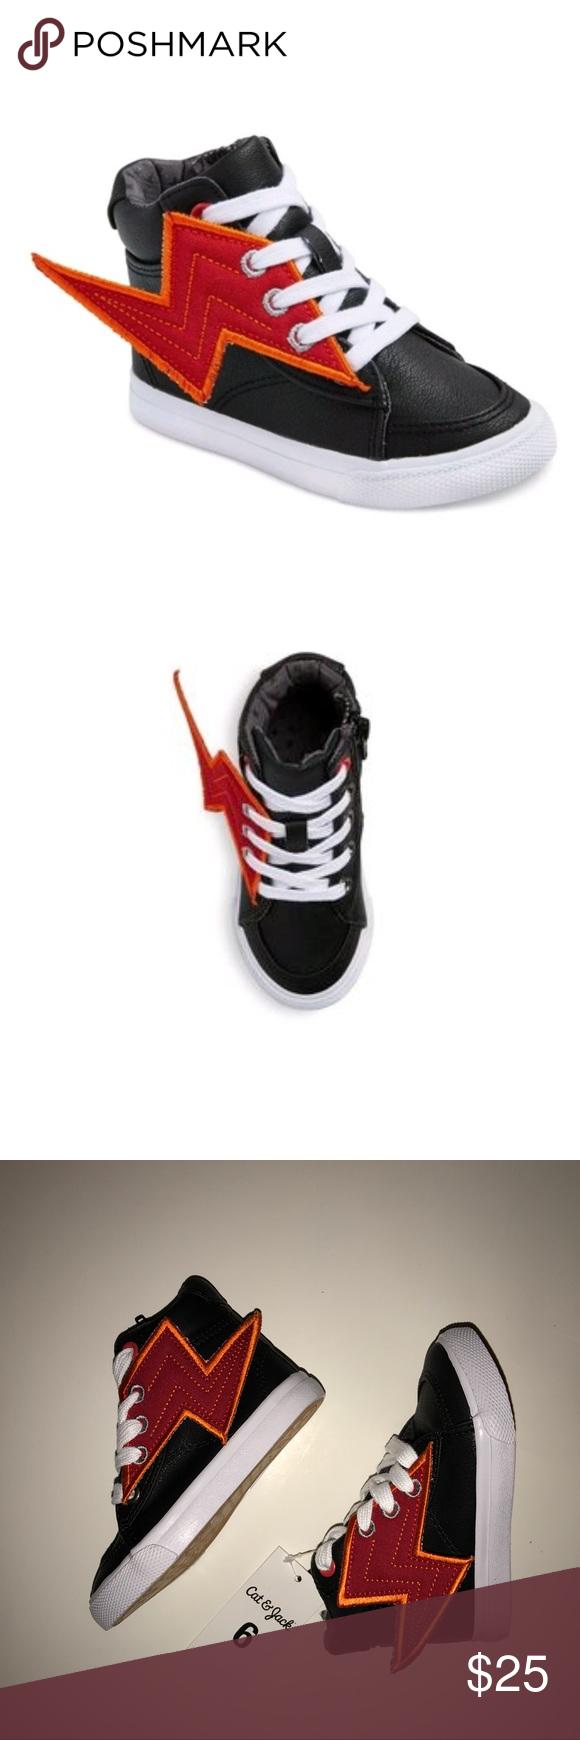 Cat /& Jack ODIS Boys Fashion Sneakers Lightning Bolts 6